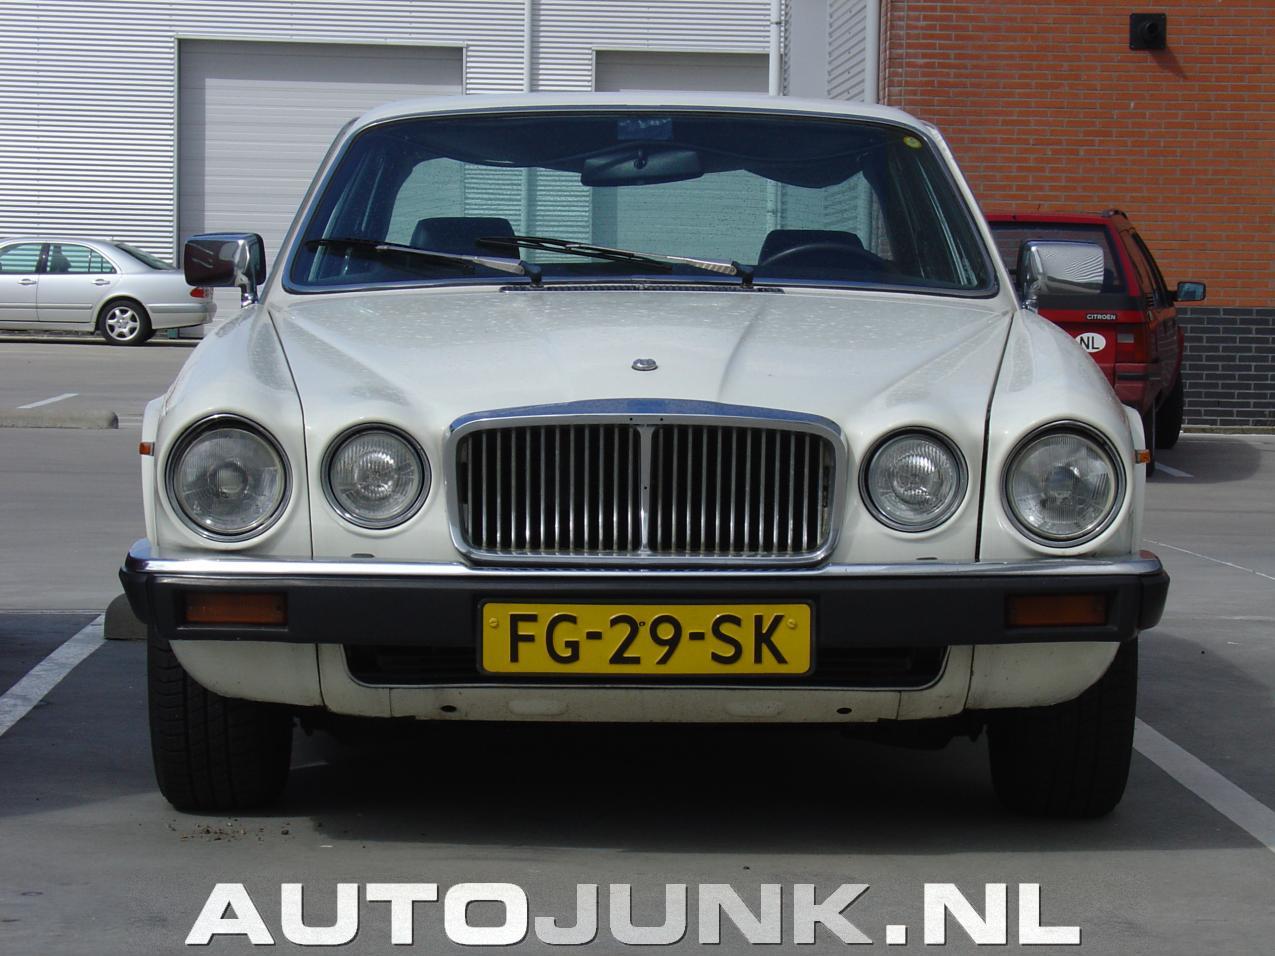 Jaguar XJ6 s3 1979 foto's » Autojunk.nl (190630)